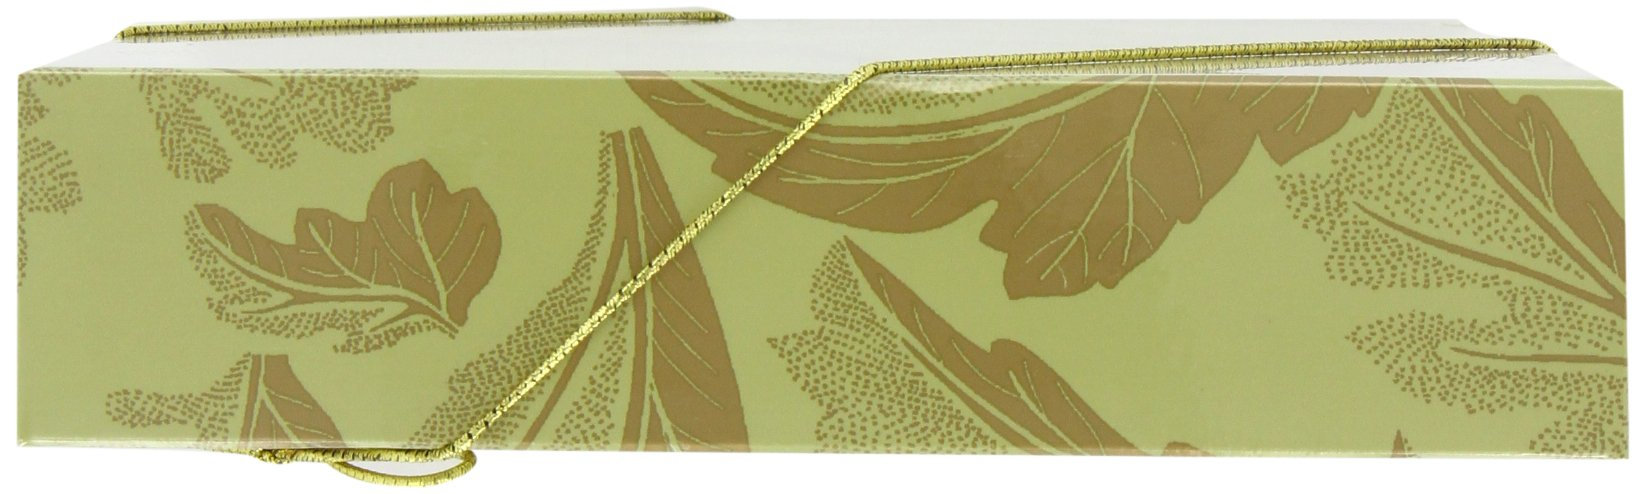 Stash Tea Gold Leaf Nine Flavor Gift Box by Stash Tea (Image #5)